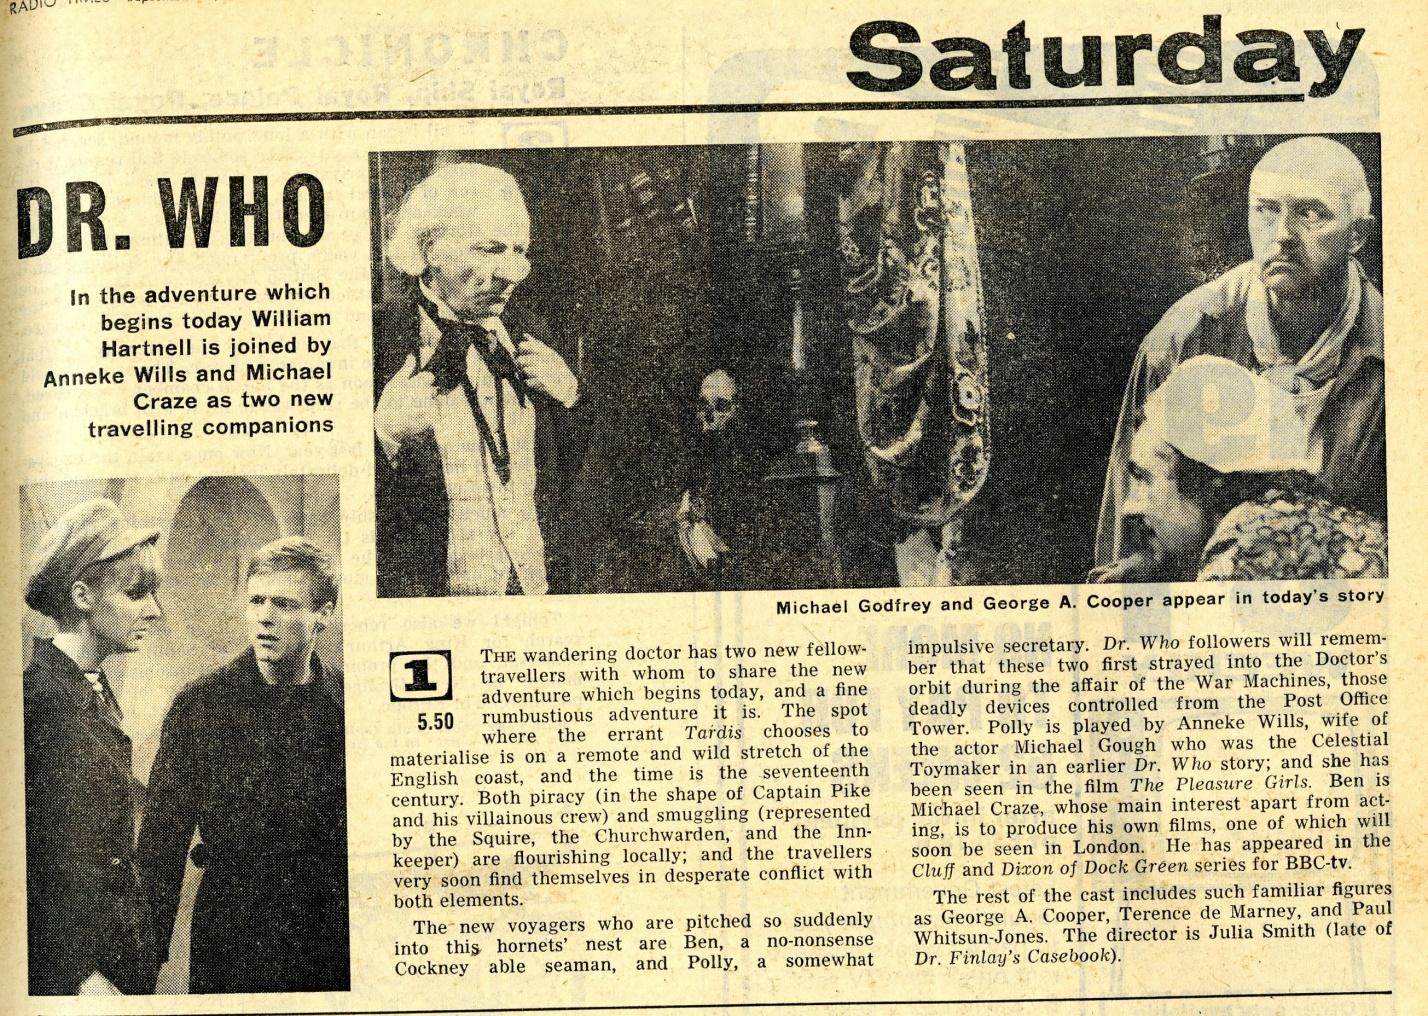 Radio Times, 10-16 September 1966